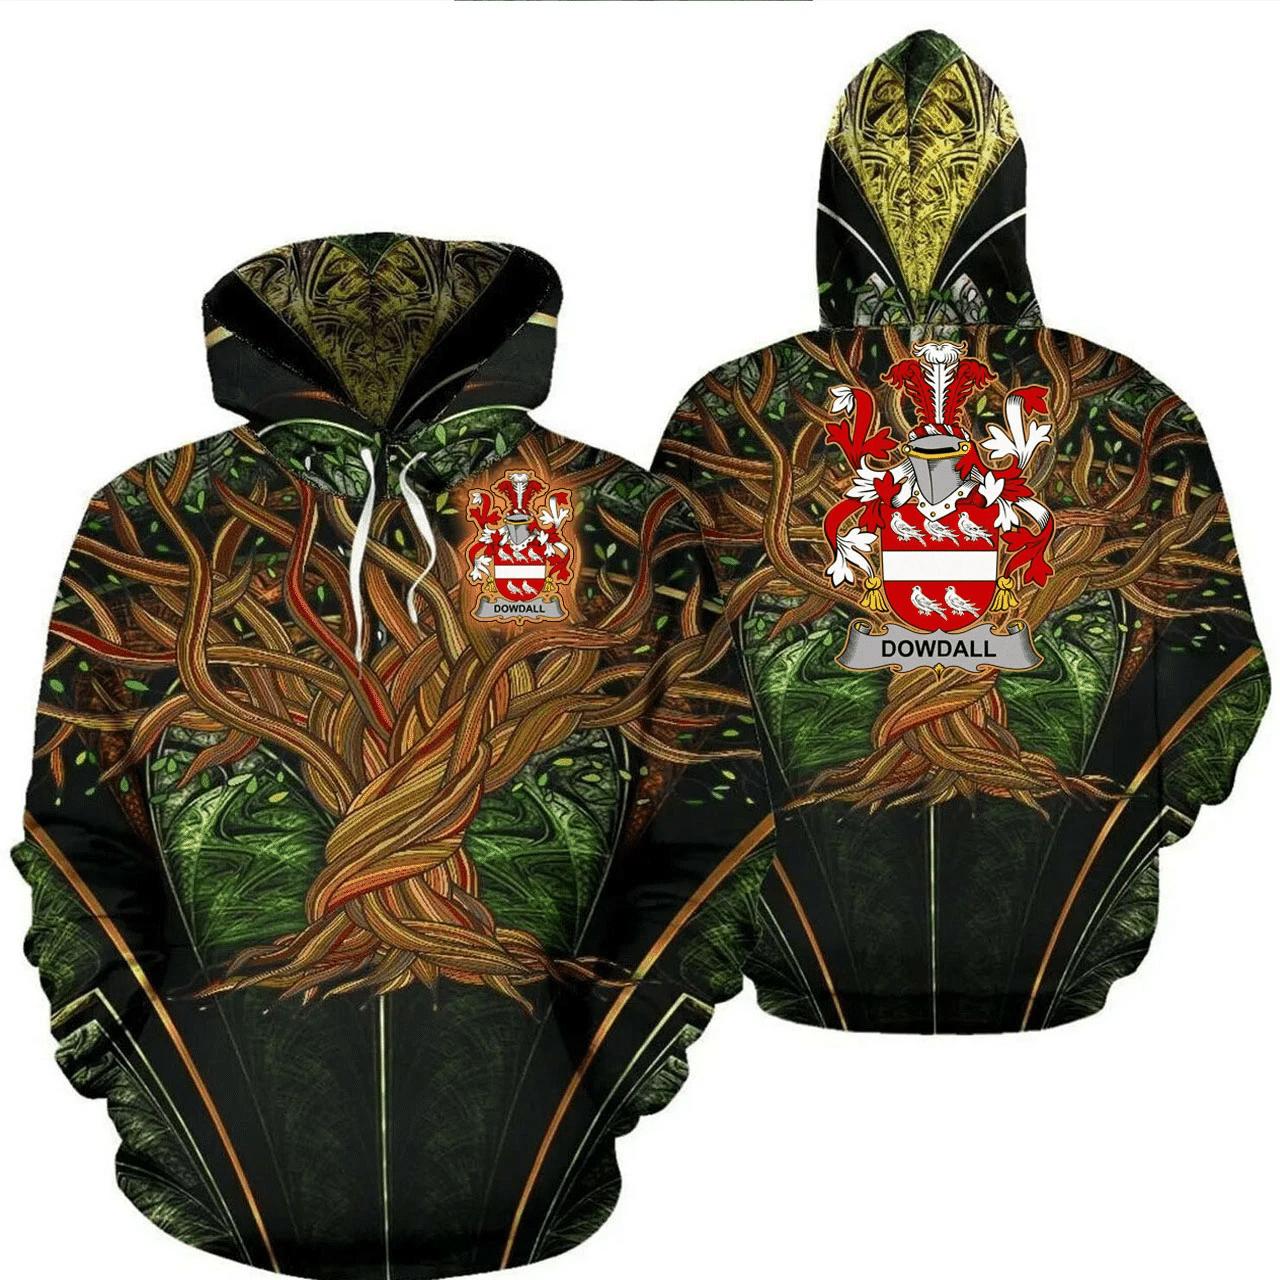 1stIreland Ireland Hoodie - Dowdall Irish Family Crest Hoodie - Tree Of Life A7